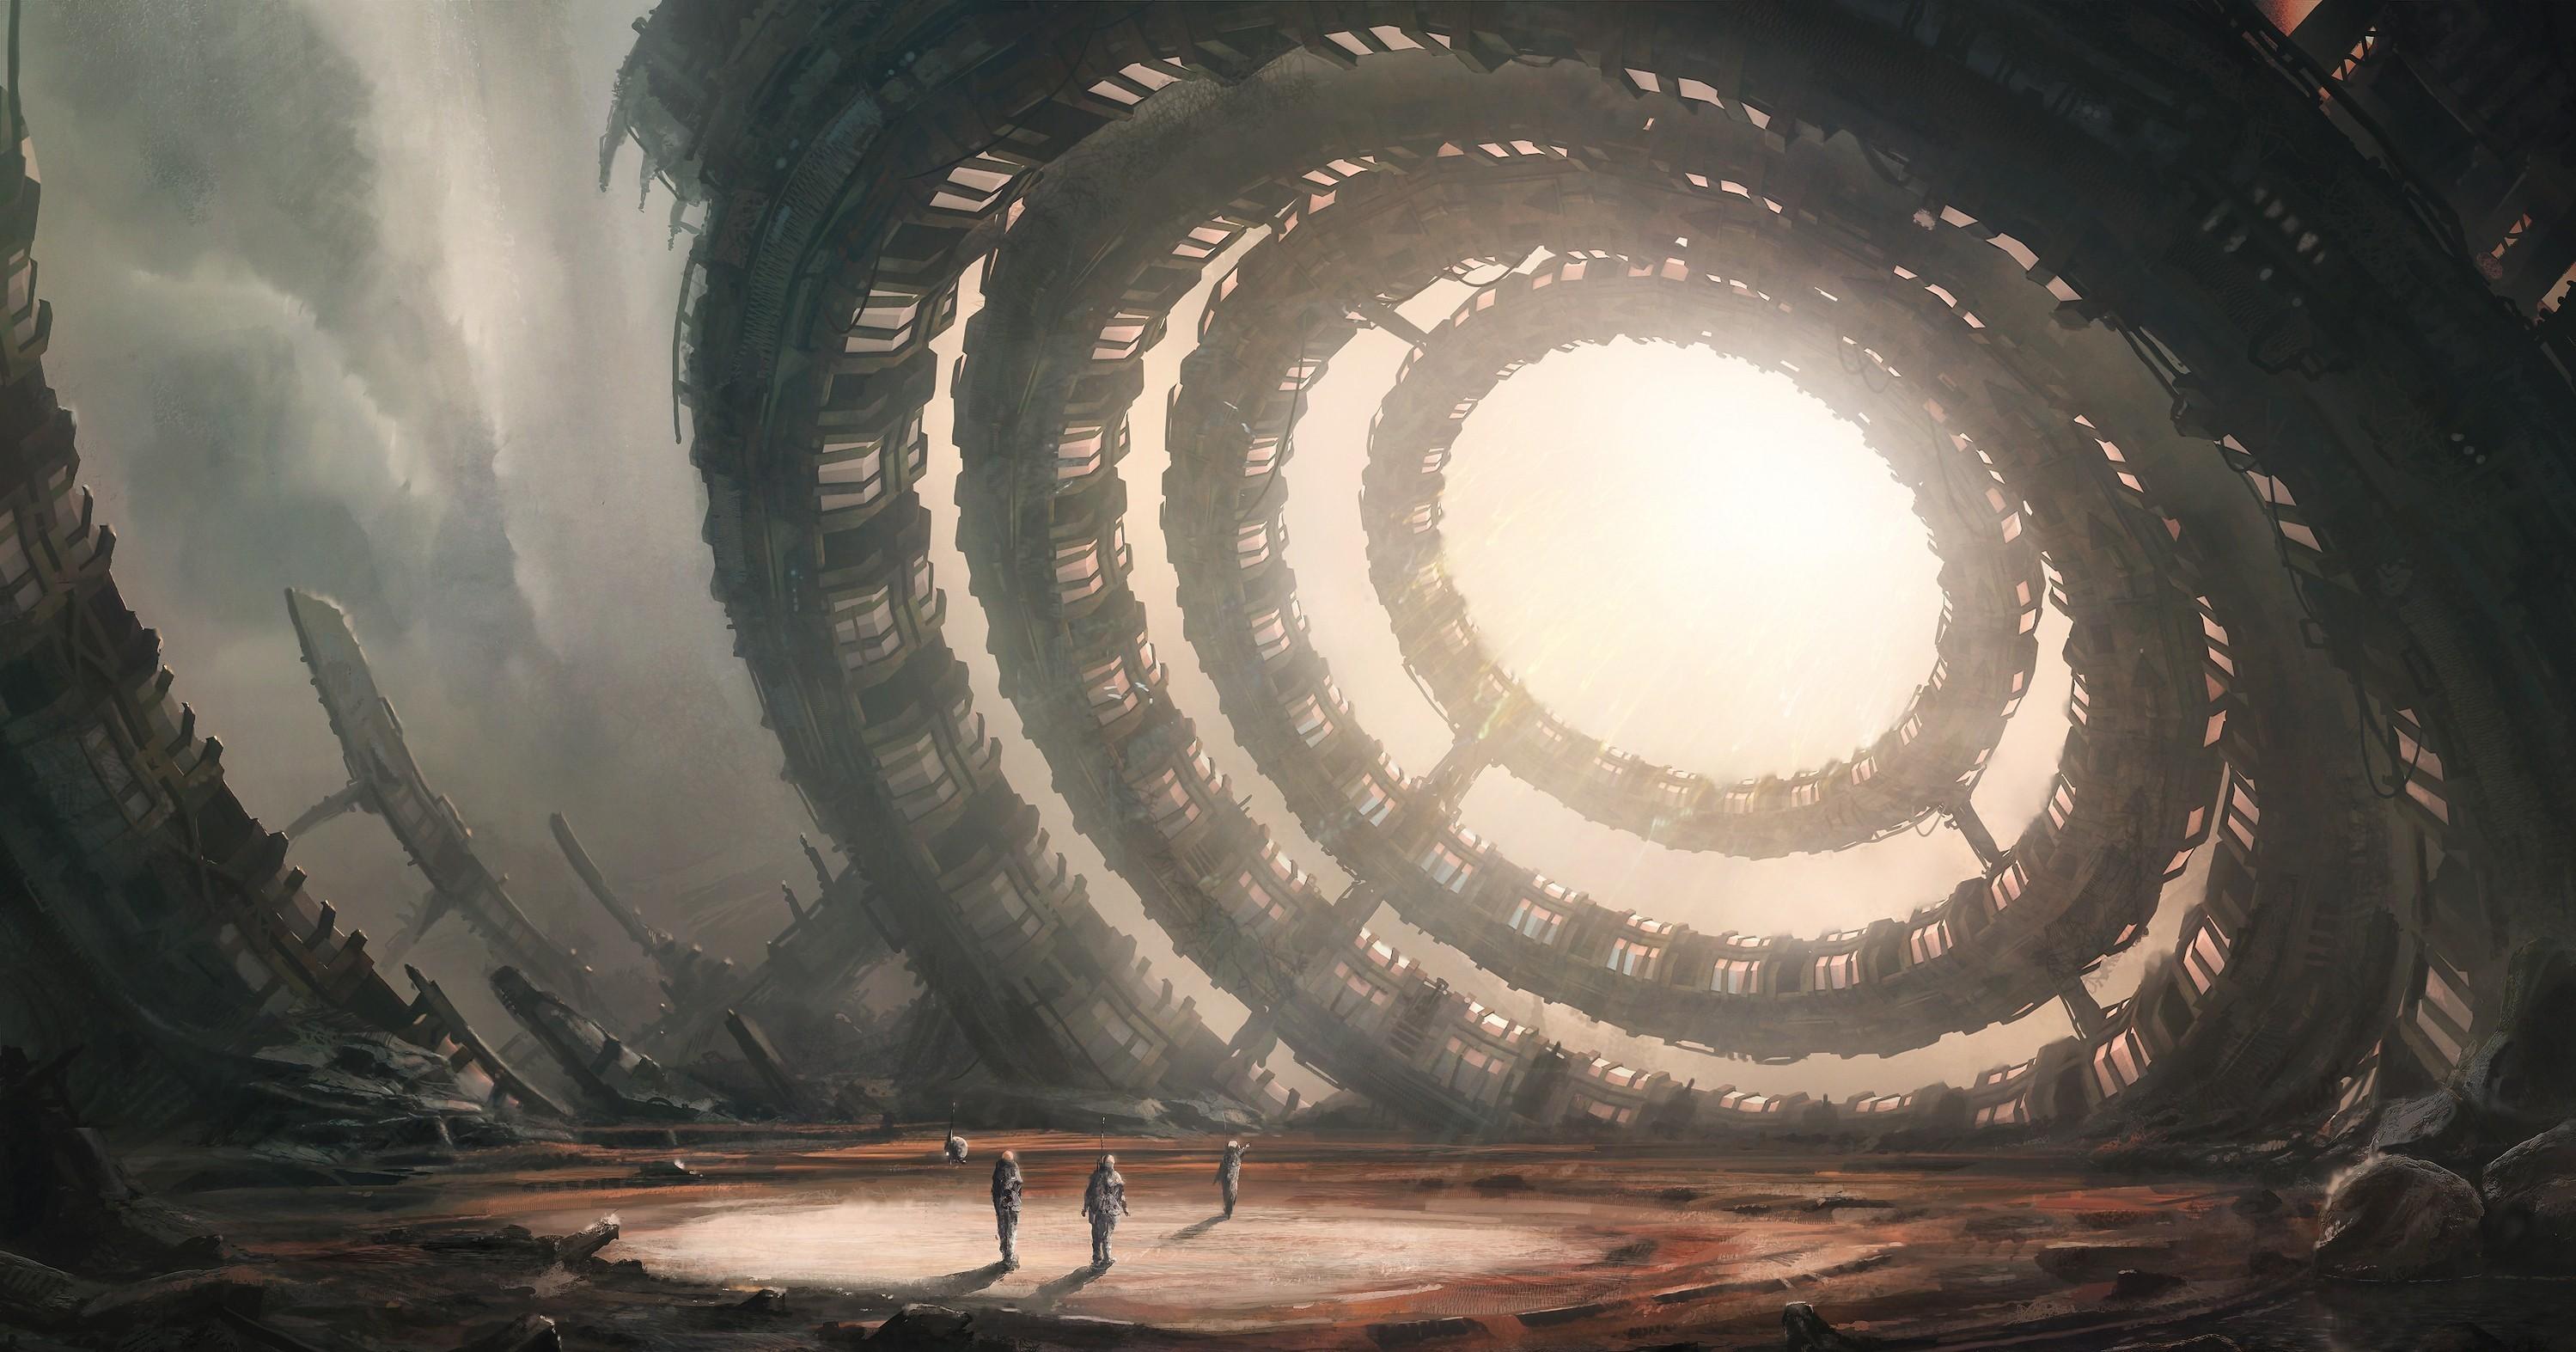 General 2998x1573 artwork science fiction futuristic